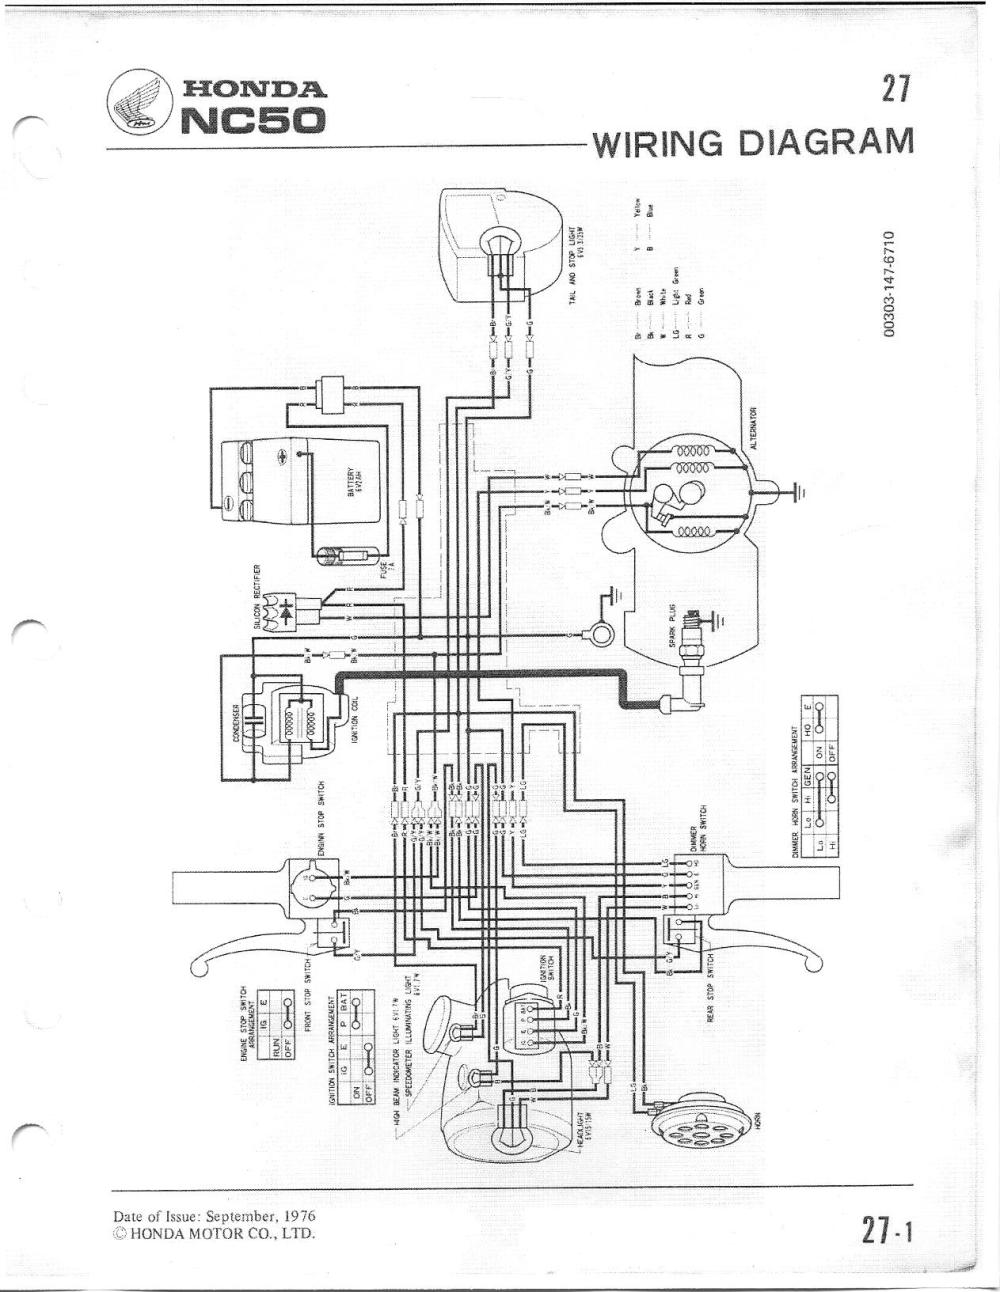 medium resolution of honda express wiring diagram database reg honda express wiring honda express wiring source 1982 honda nc50